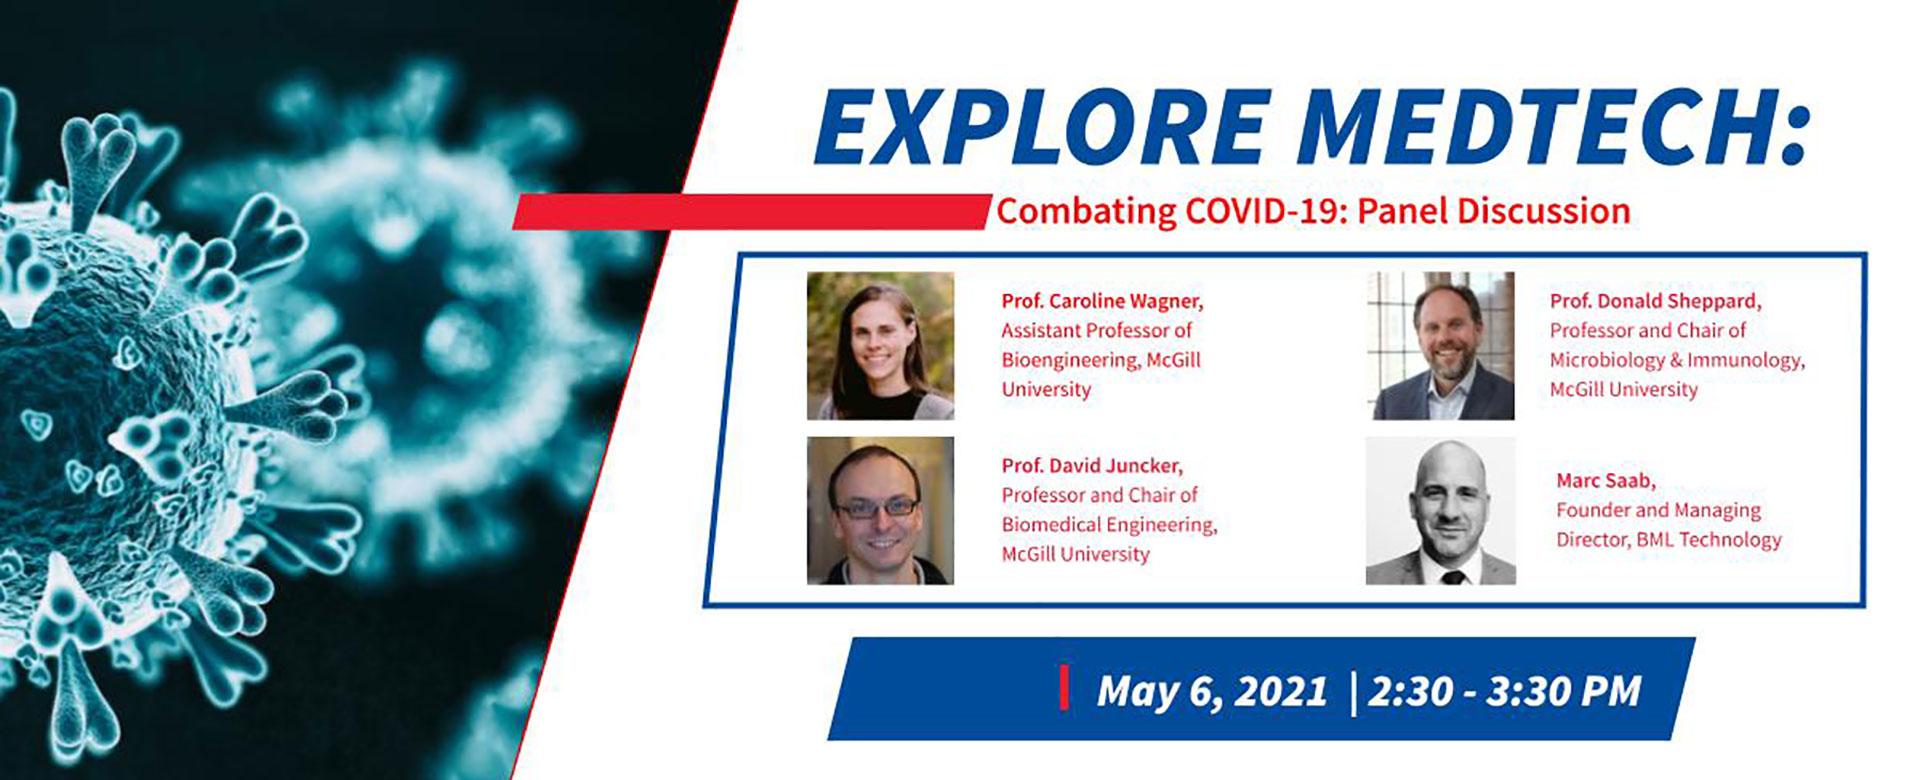 Explore-Medtech-Combating-Covid-19